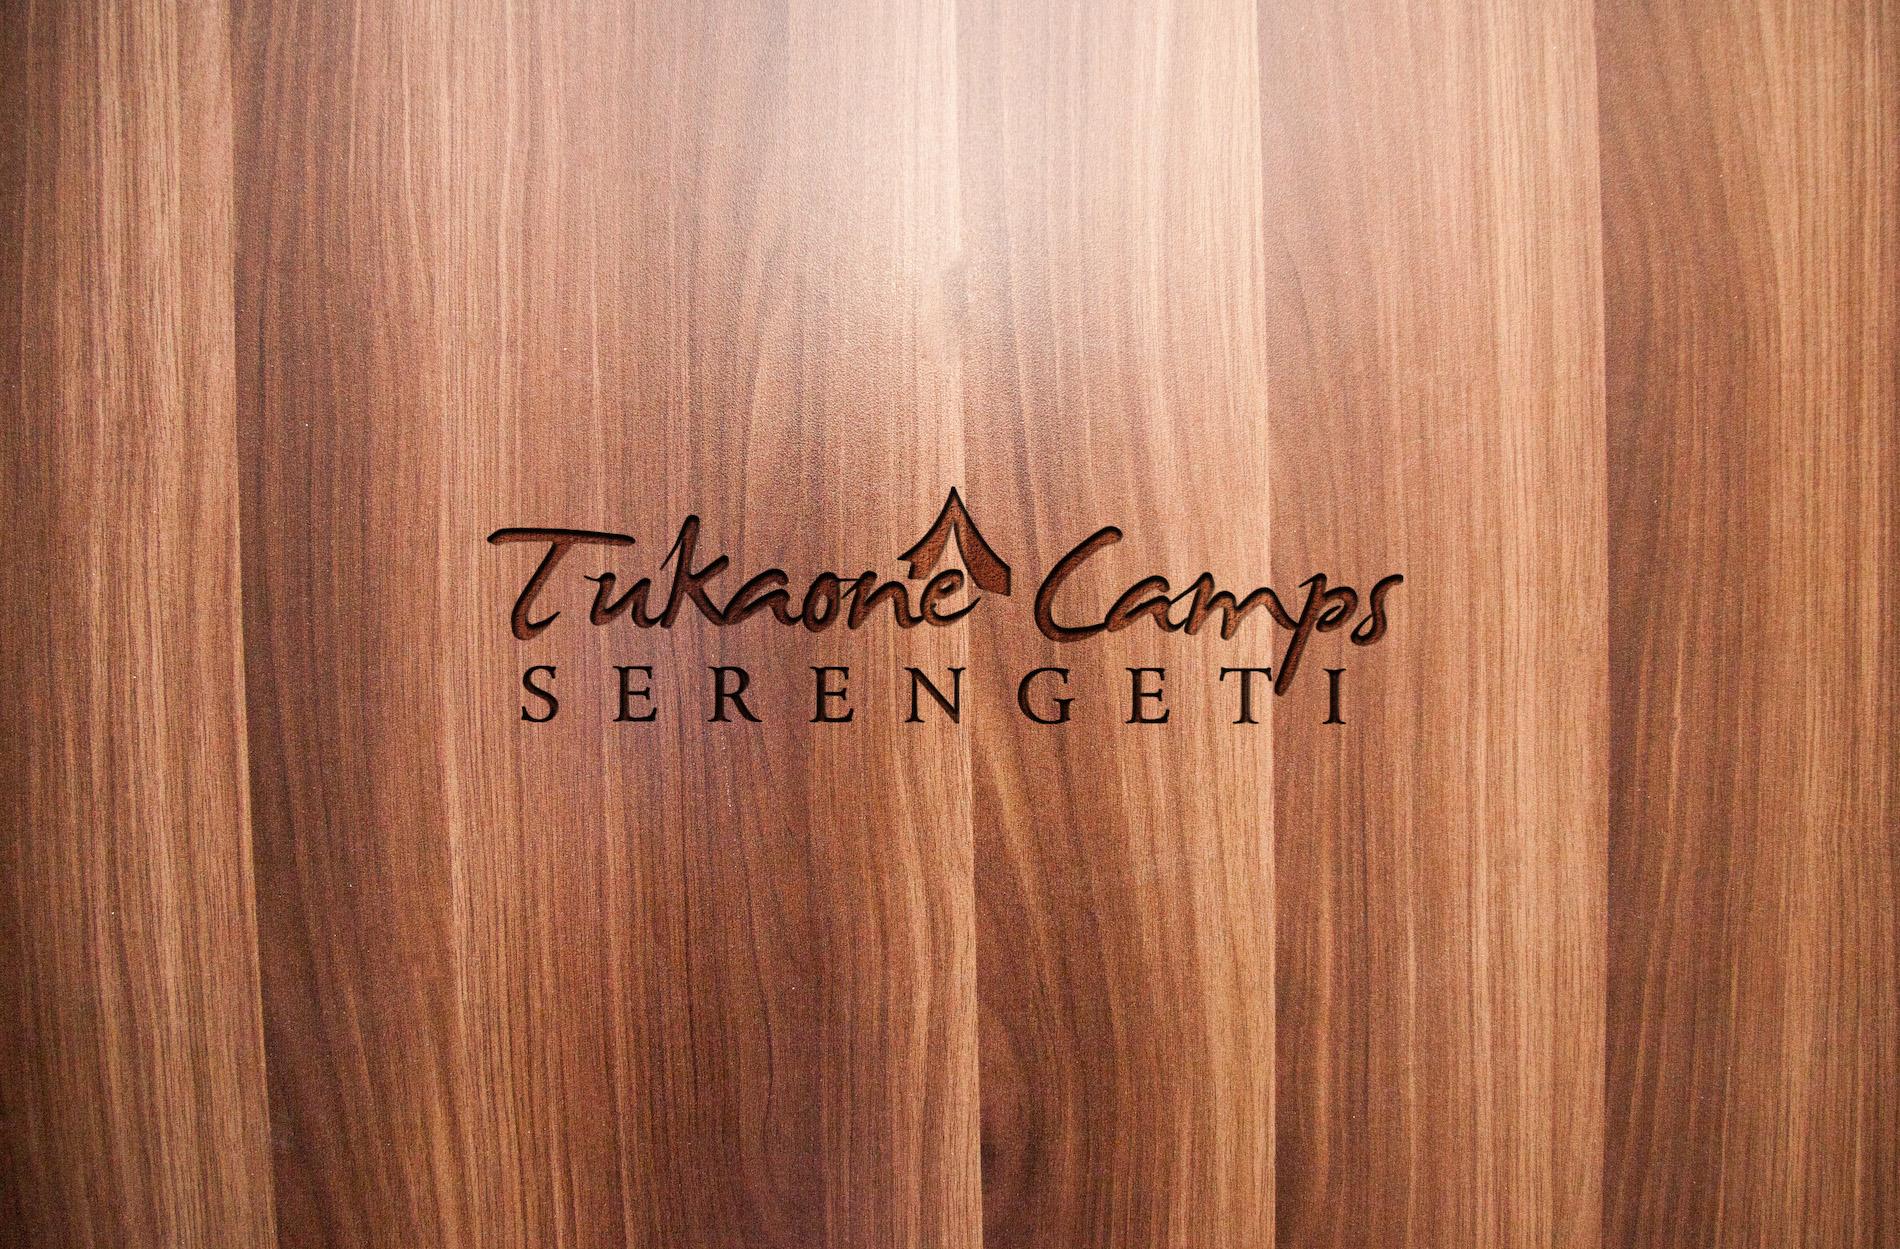 Tukaone Camps